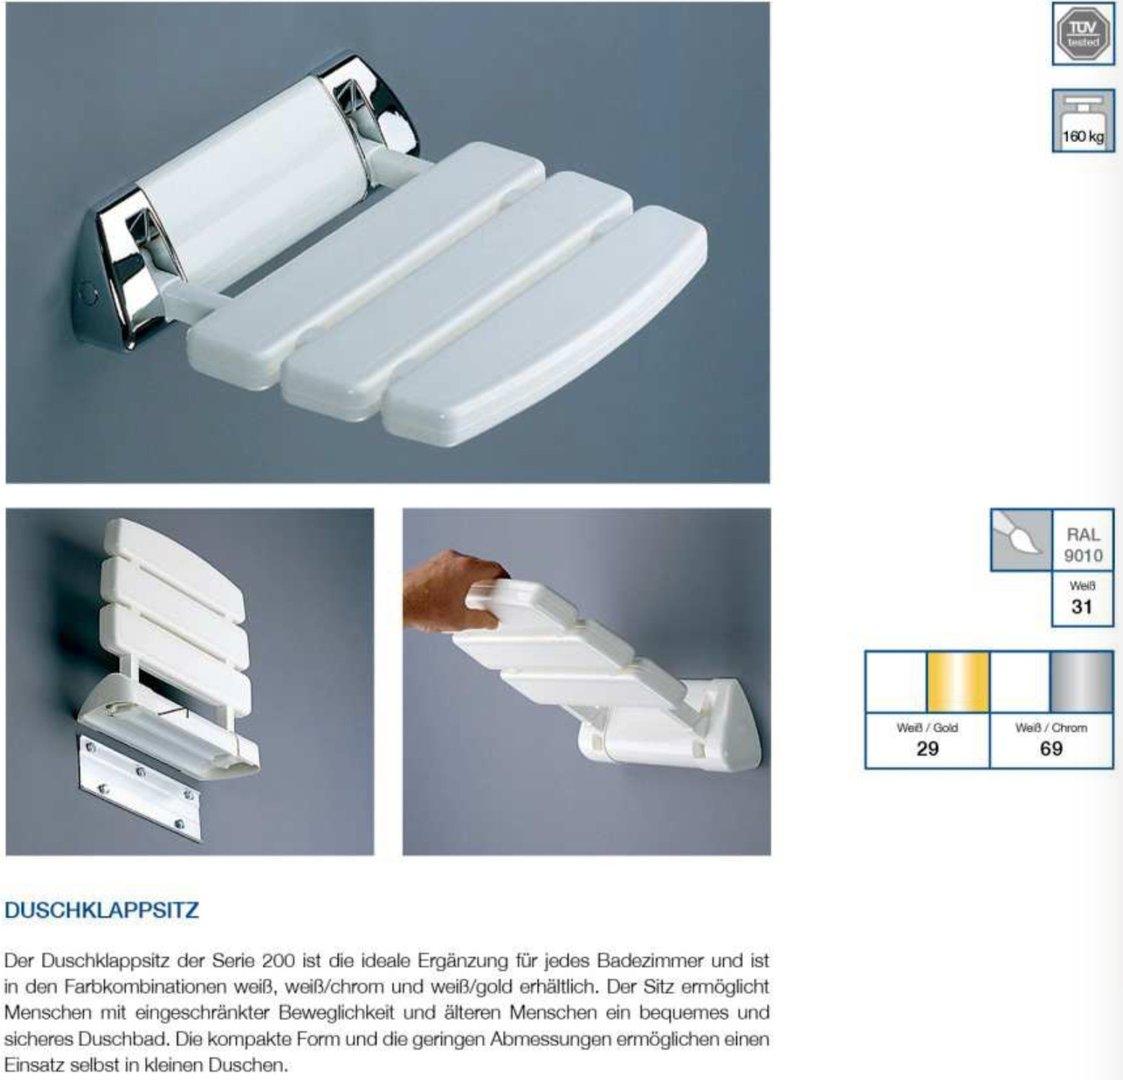 coram promed serie 200 duschklappsitz mit befestigung weiss chrom. Black Bedroom Furniture Sets. Home Design Ideas